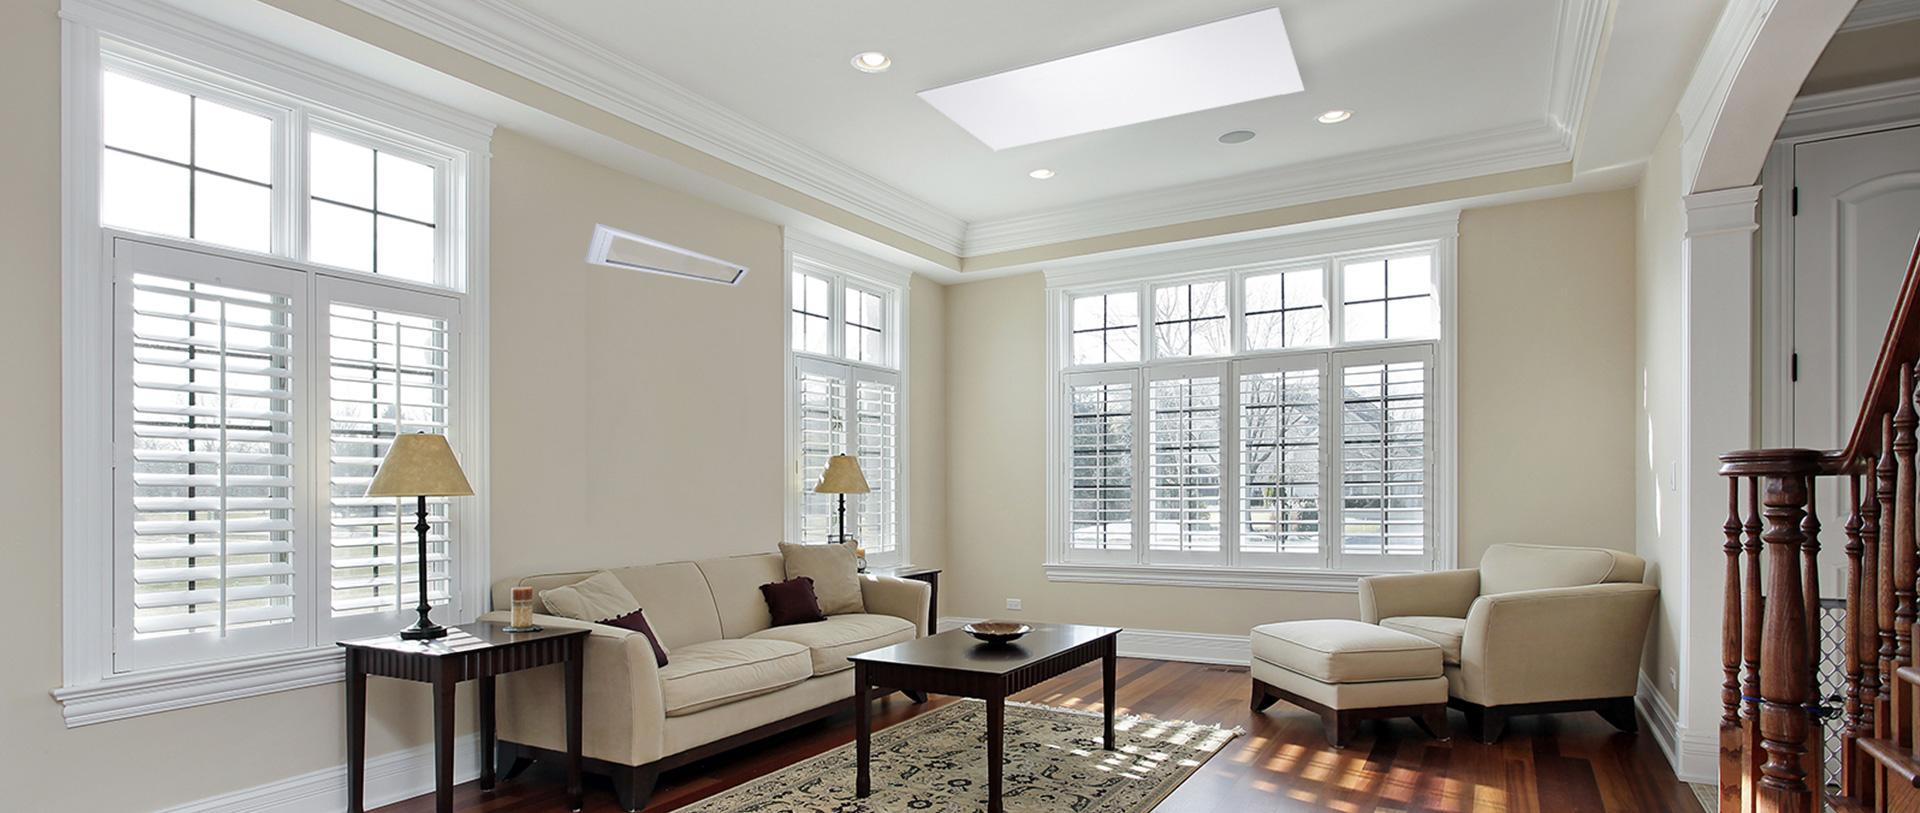 Stabil varme i et privat hus